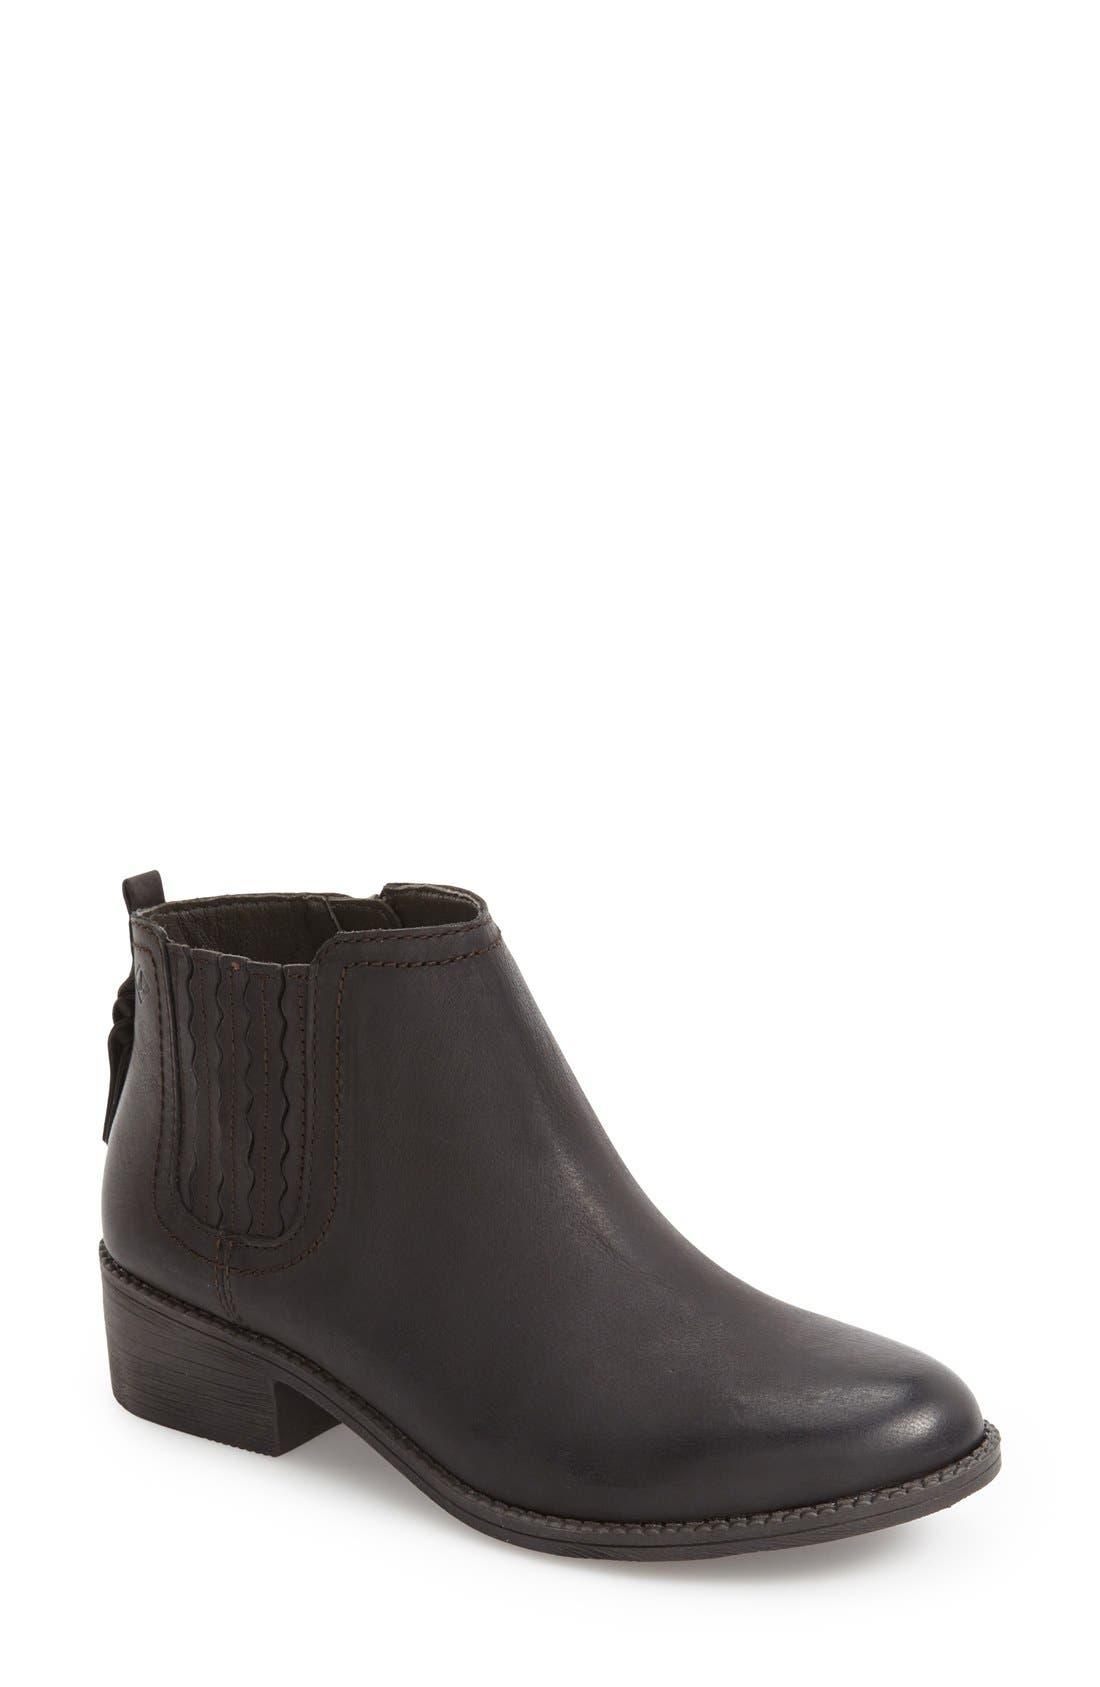 SPERRY Juniper Bree Chelsea Boot, Main, color, 001